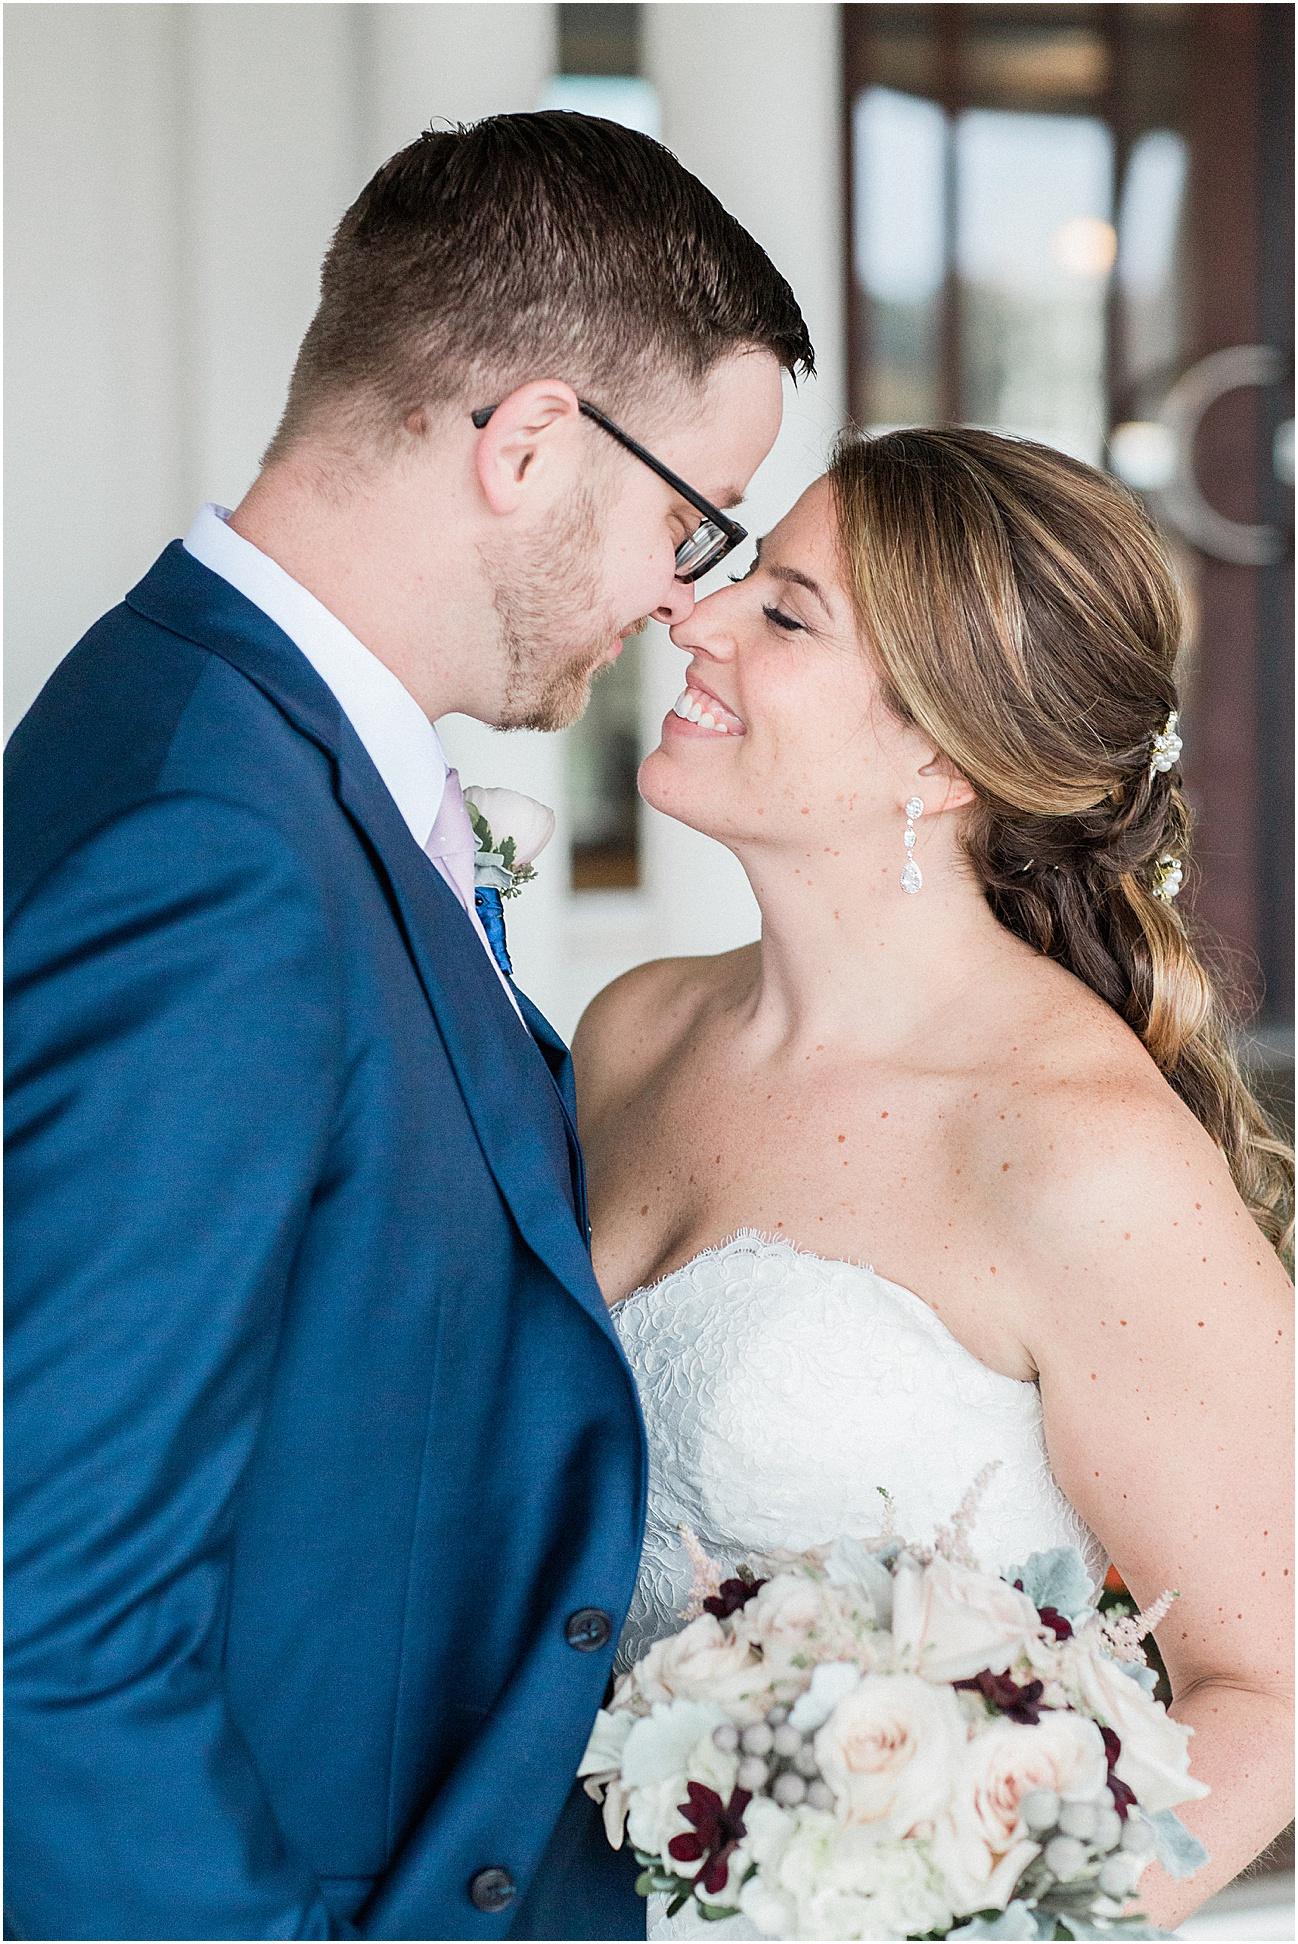 danielle_sean_willowbend_rain_rainy_day_cape_cod_boston_wedding_photographer_meredith_jane_photography_photo_1674.jpg